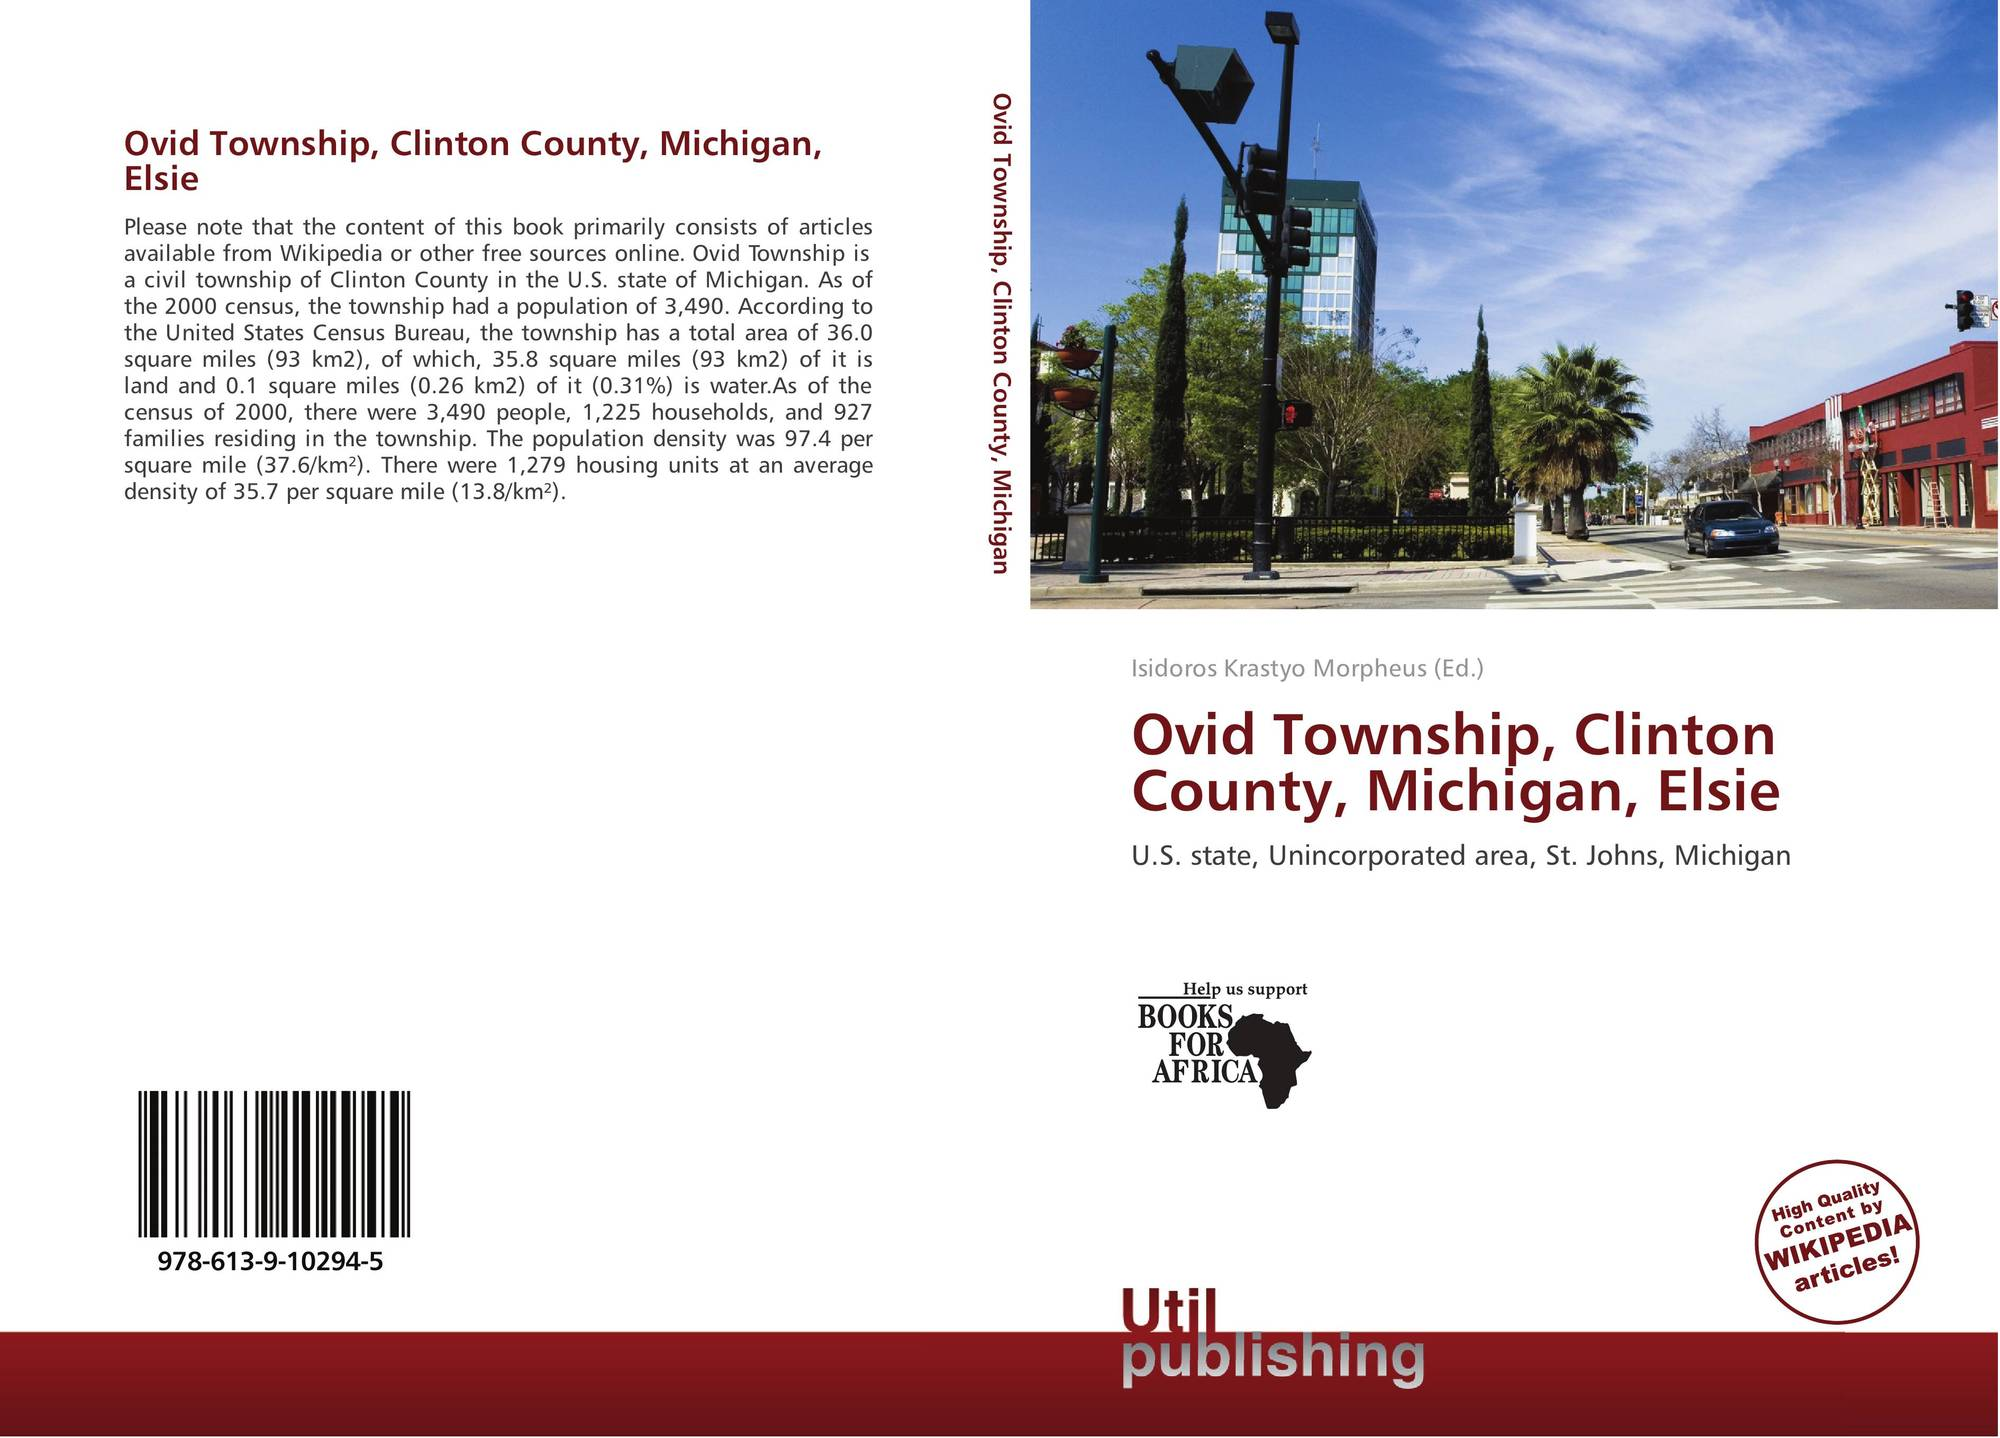 Michigan clinton county elsie - Bookcover Of Ovid Township Clinton County Michigan Elsie Omni Badge 9307e2201e5f762643a64561af3456be64a87707602f96b92ef18a9bbcada116